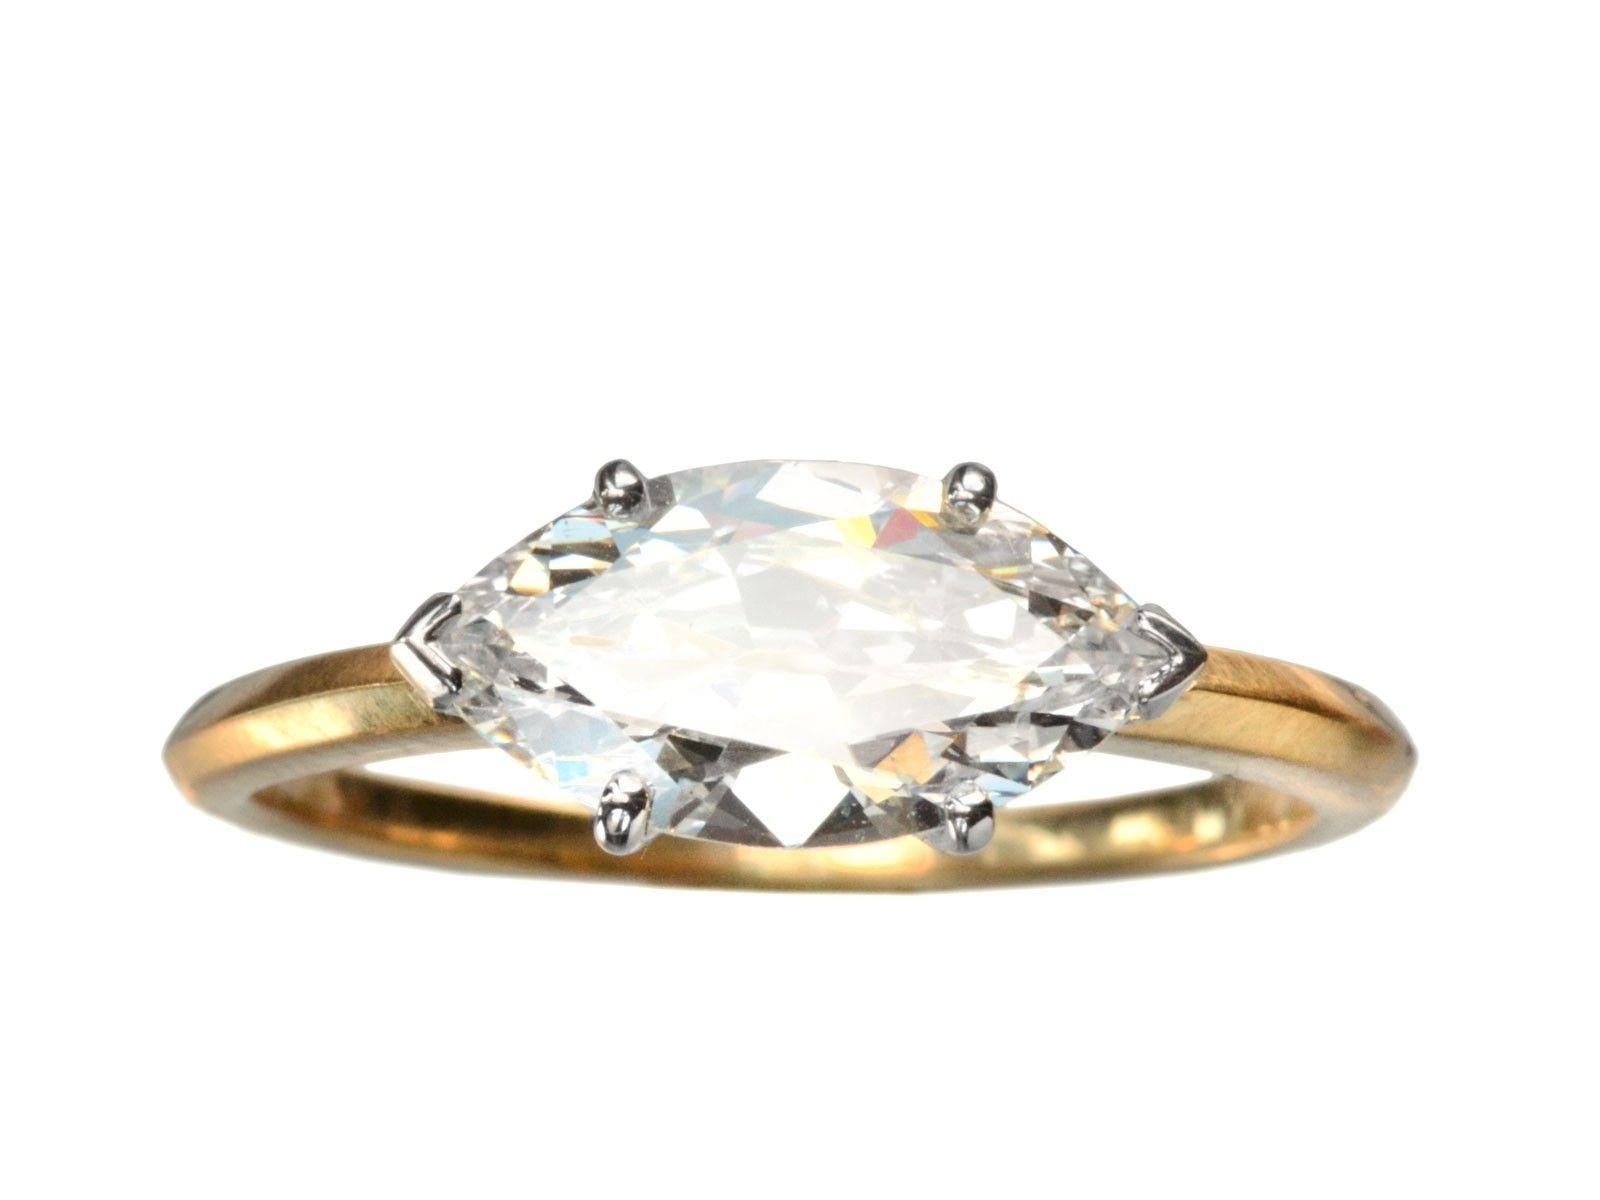 Marquise diamond setting ideas - East West Marquise Diamond Ring Setting